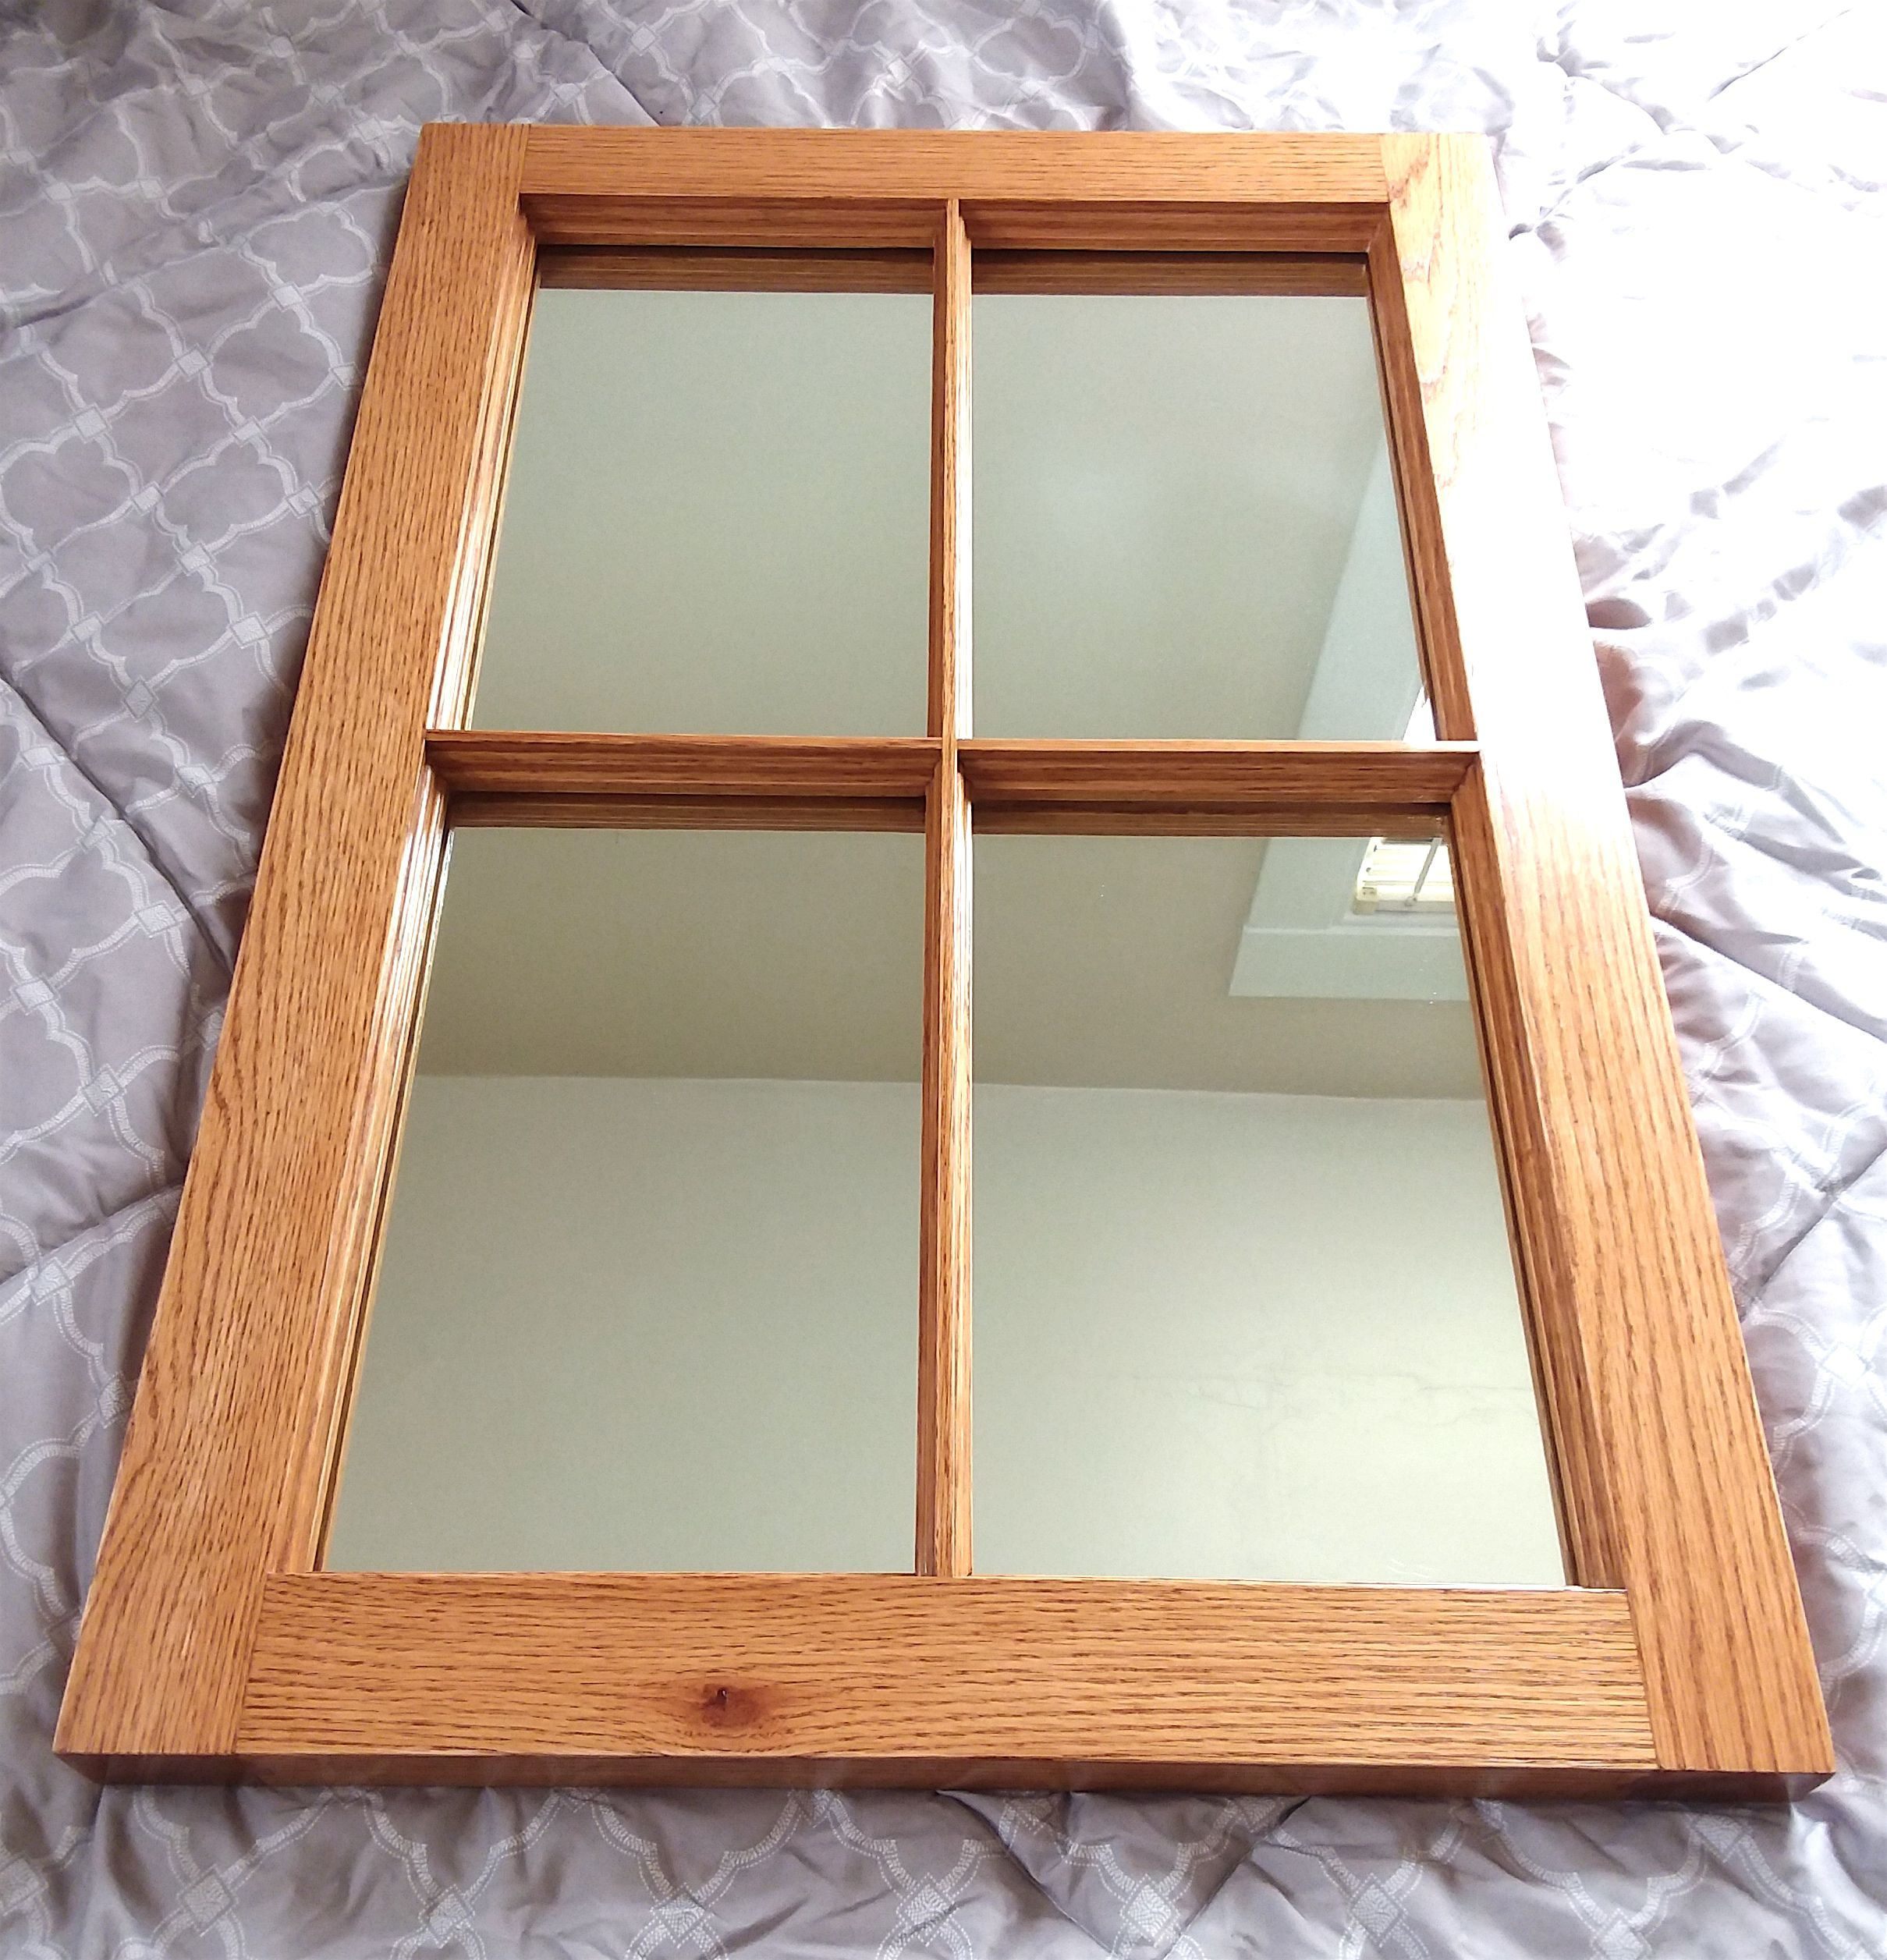 Decorative Solid Oak 4 Pane Window Frame Mirror For Entryway Living Room Hallway Kitchen Bedroom And Off Wood Window Frame Window Frame Mirror Window Frame